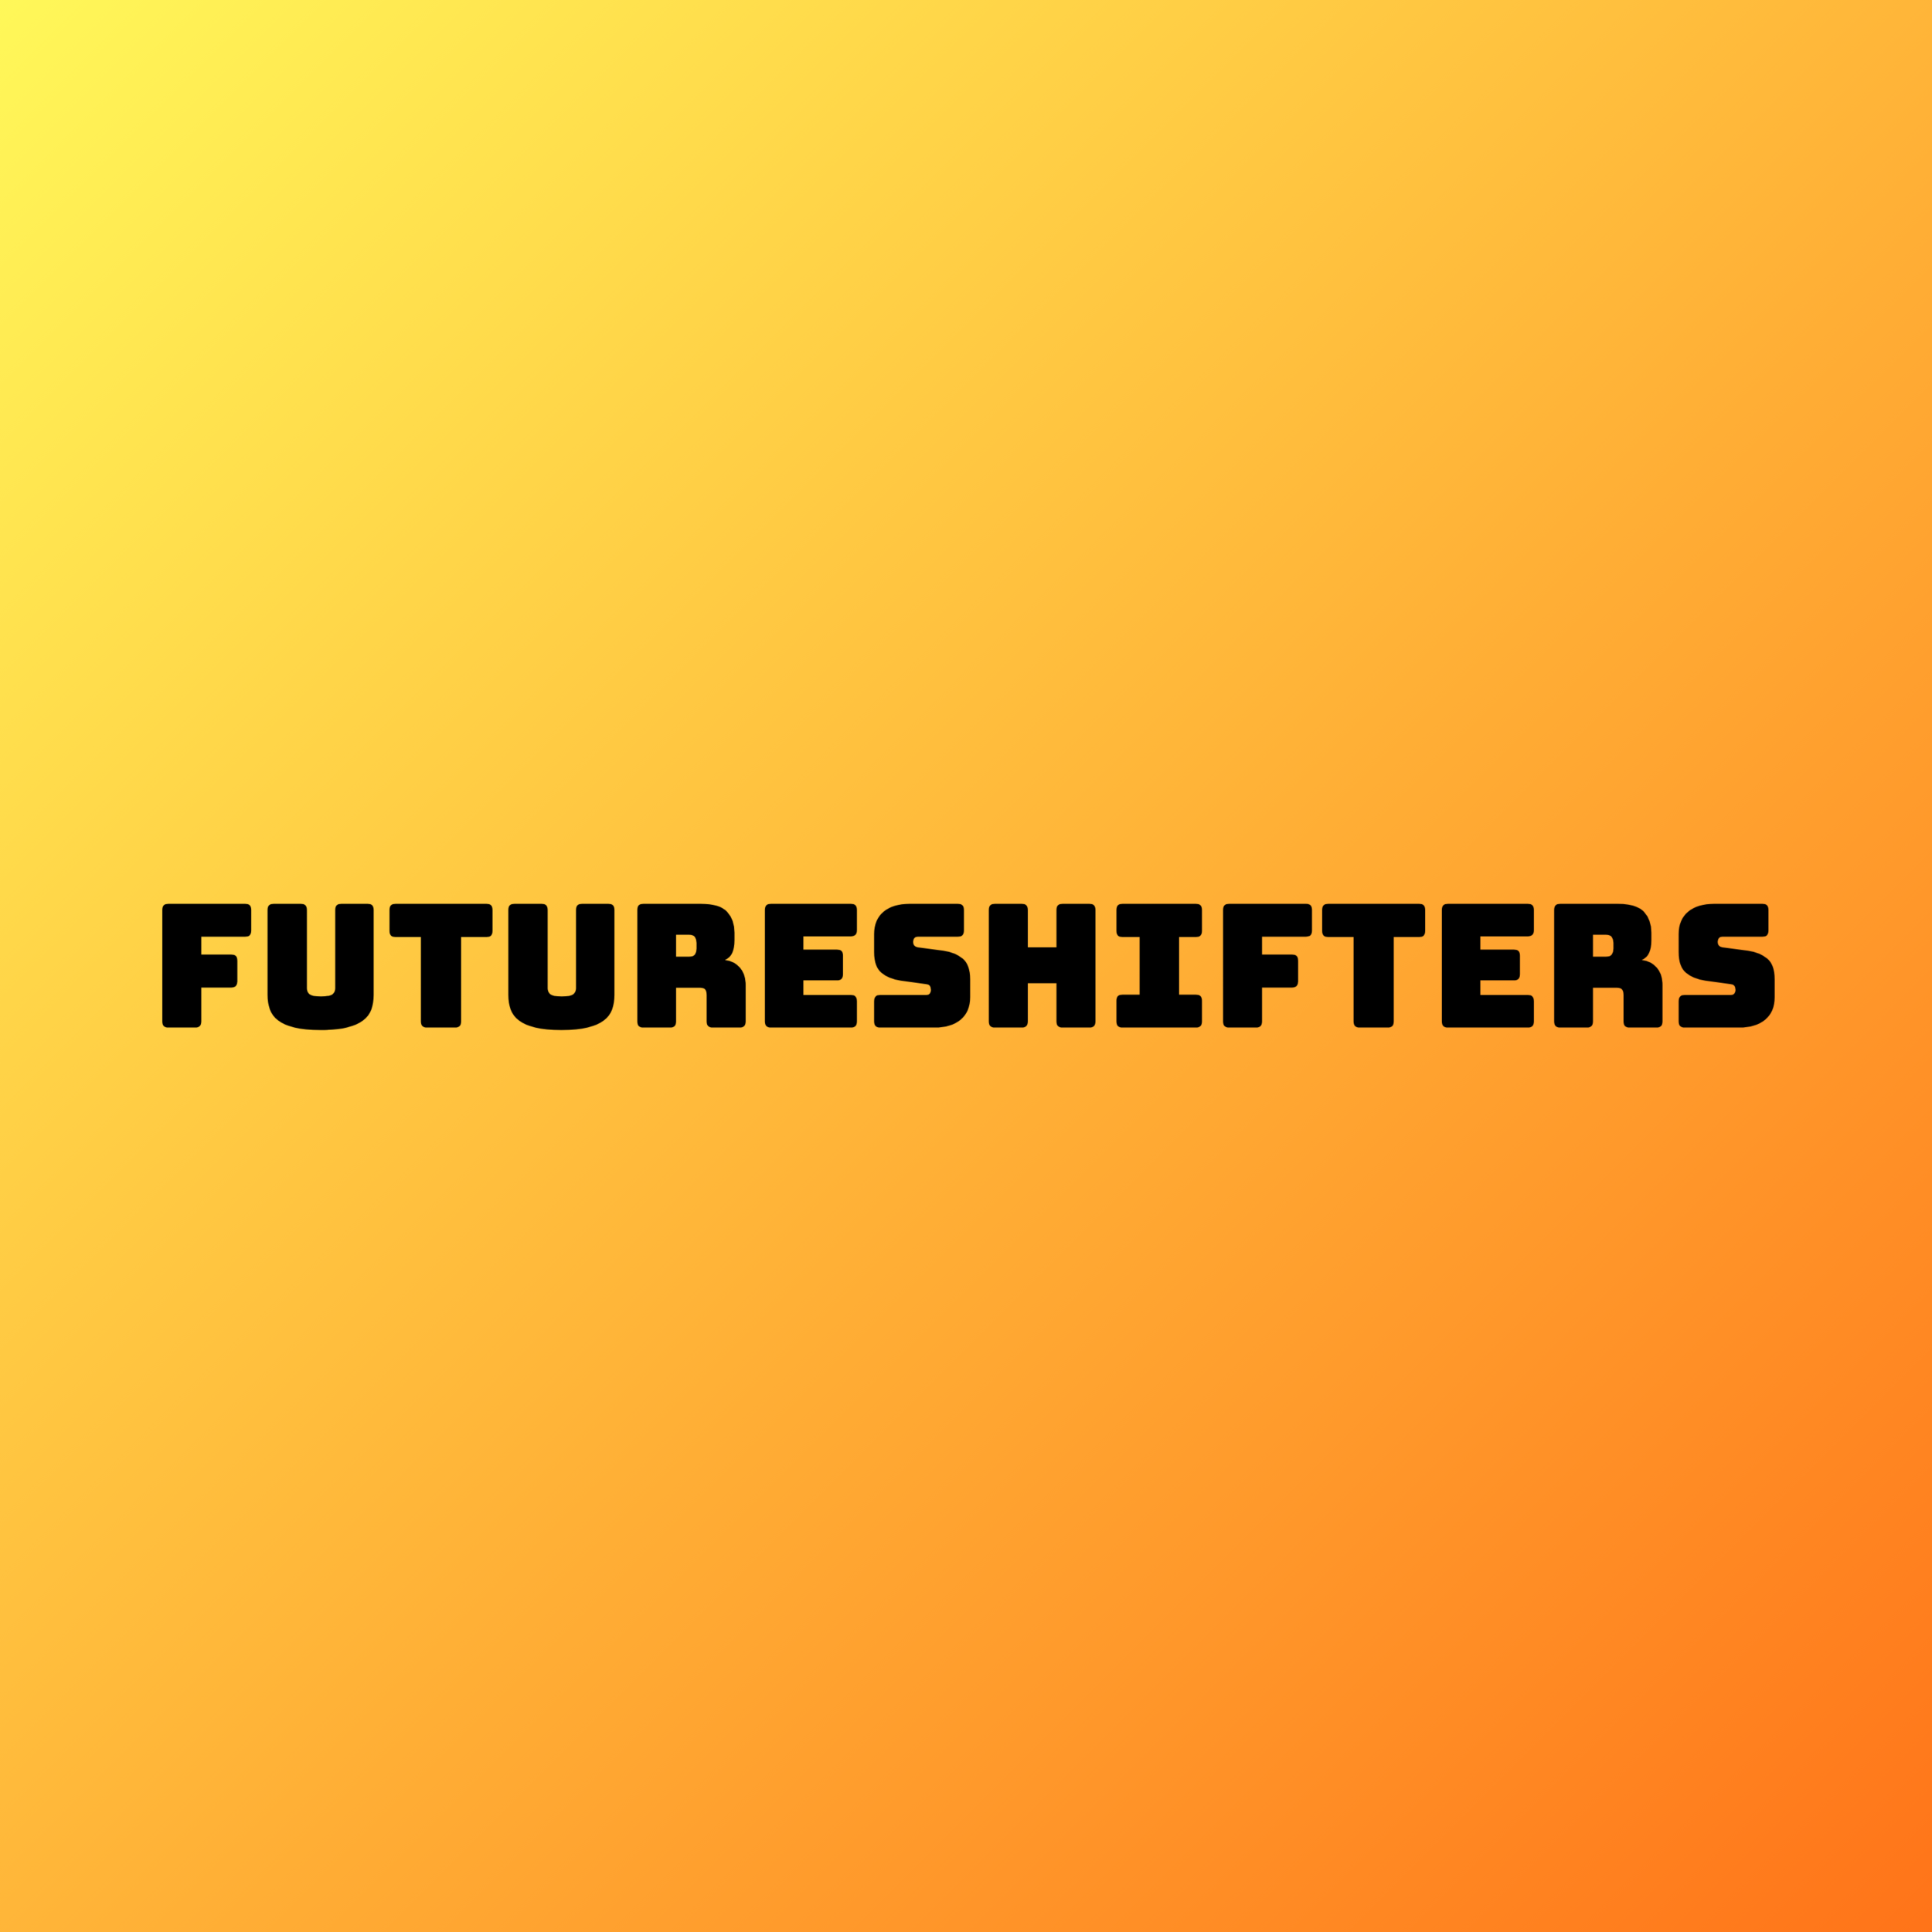 Futureshifters